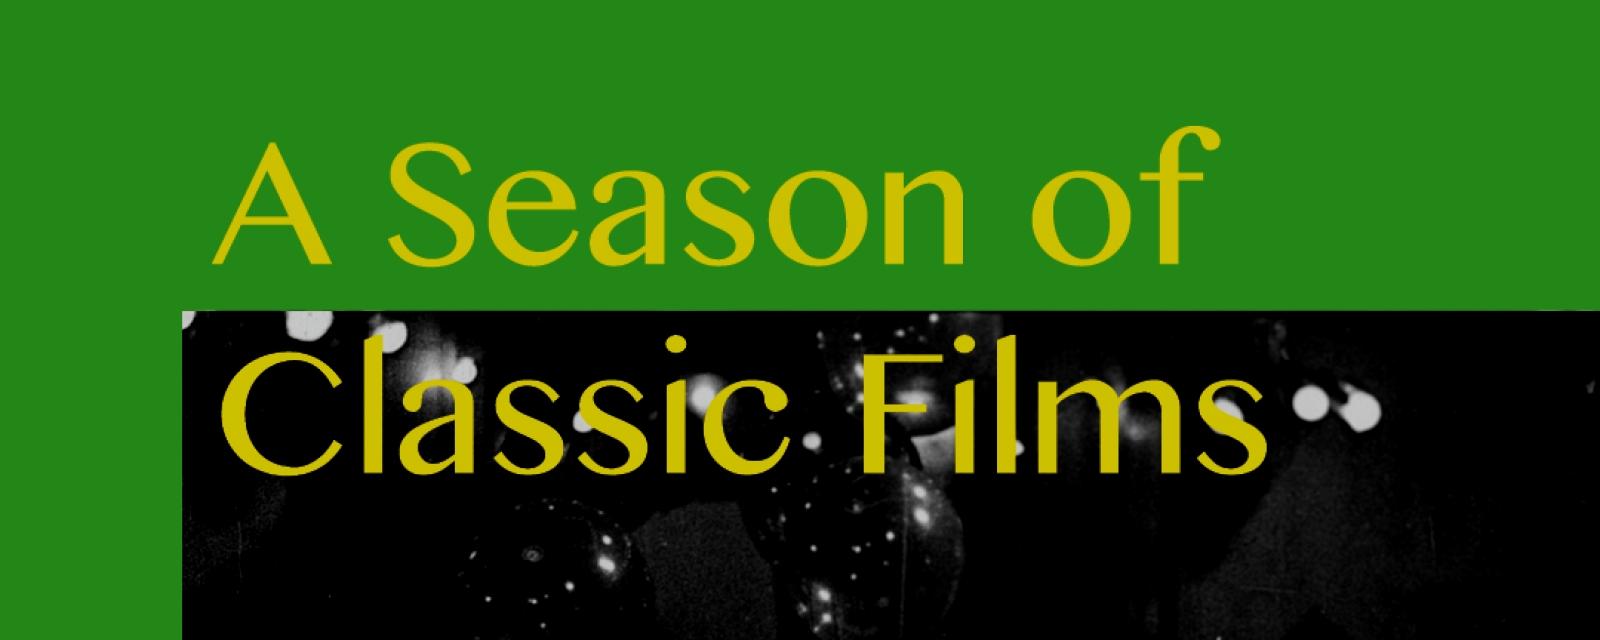 a_season_of_classic_films